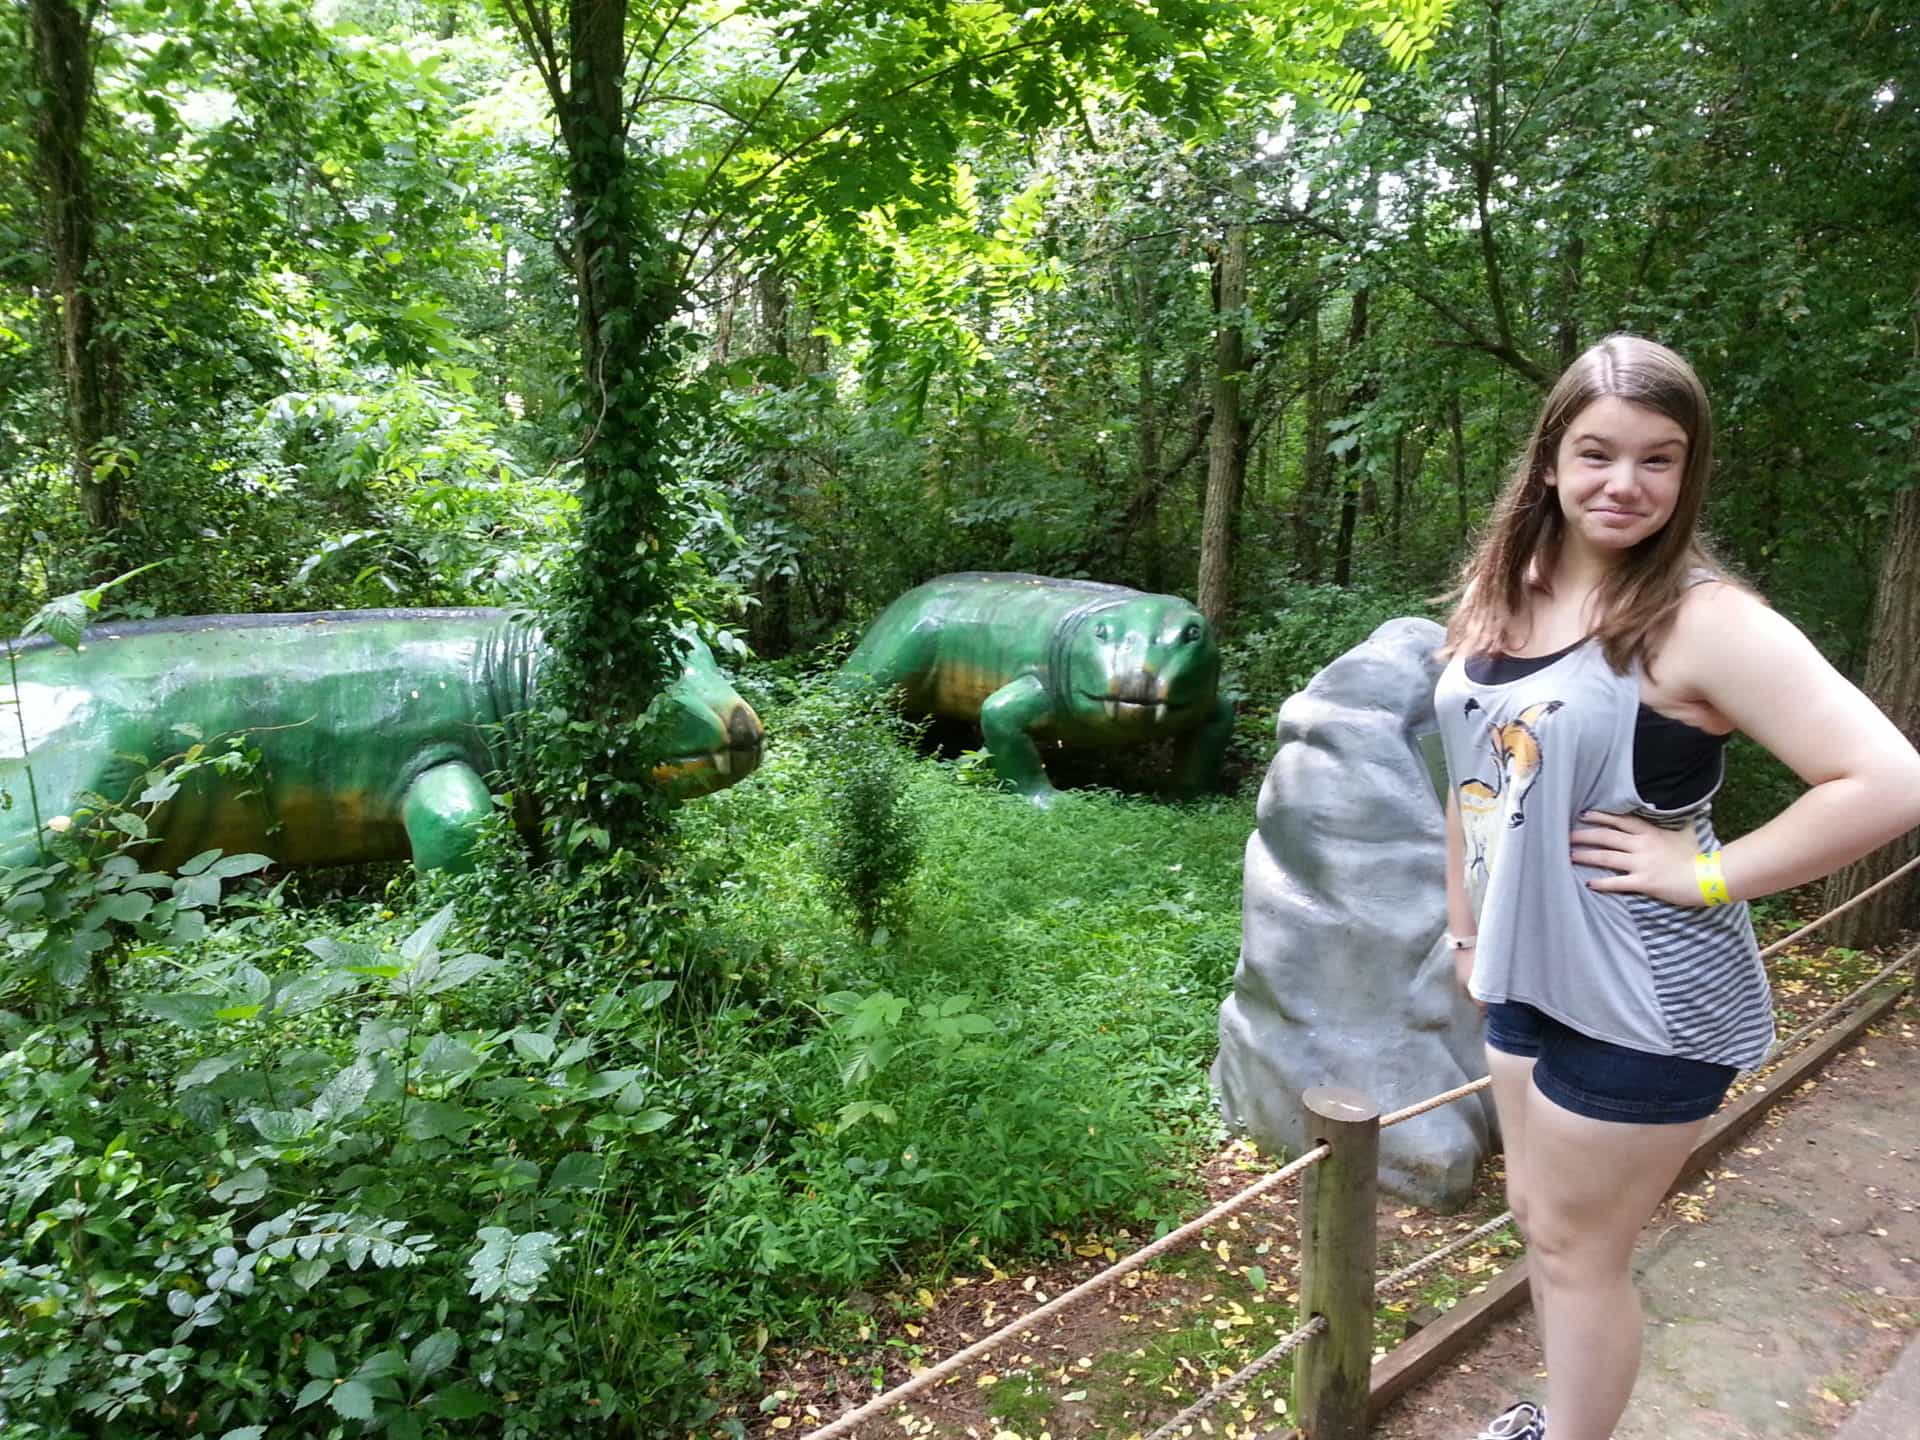 Dinosaur World - Iguanodon